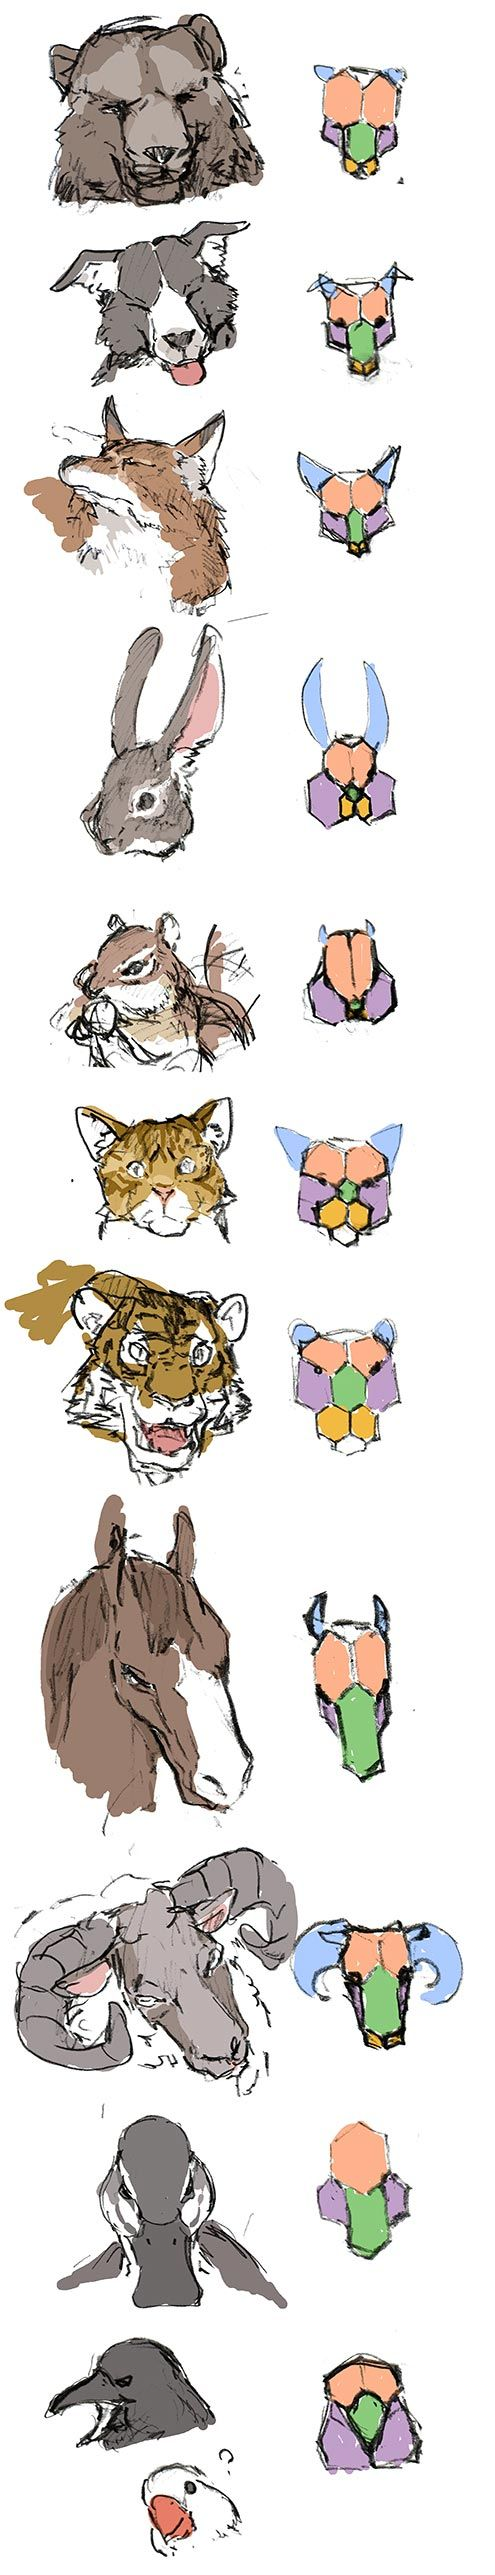 sketch-study with animal face by hira-geco.deviantart.com on @deviantART